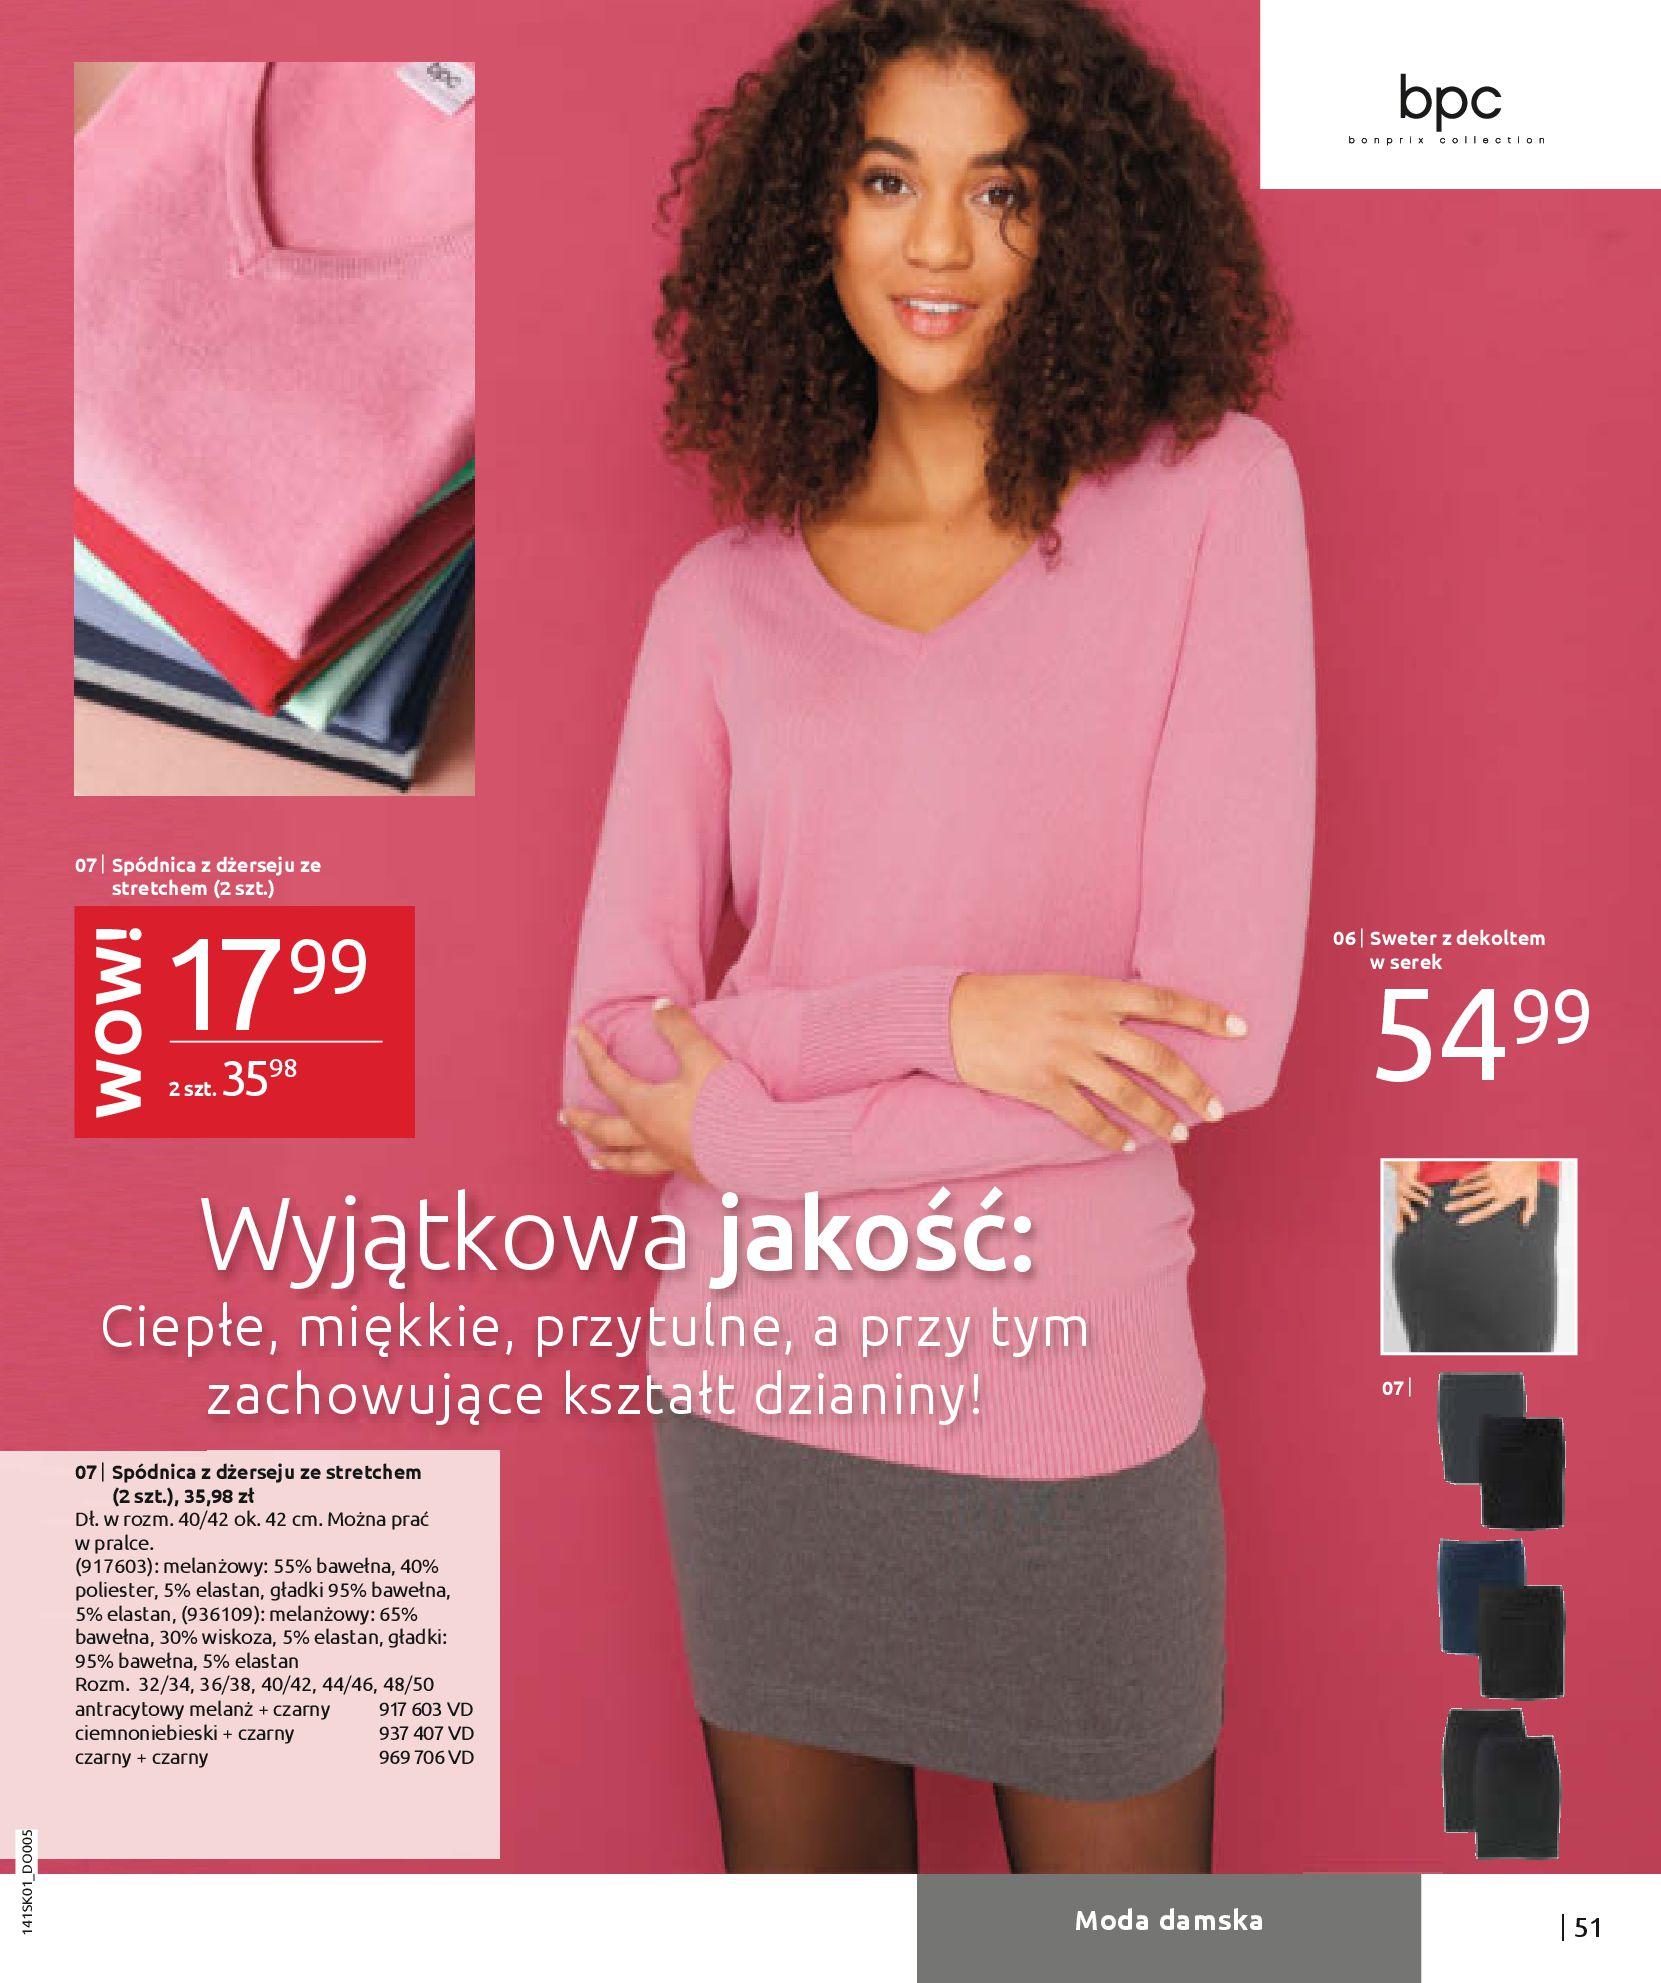 Gazetka Bonprix - Oferta handlowa-20.01.2020-31.03.2020-page-53